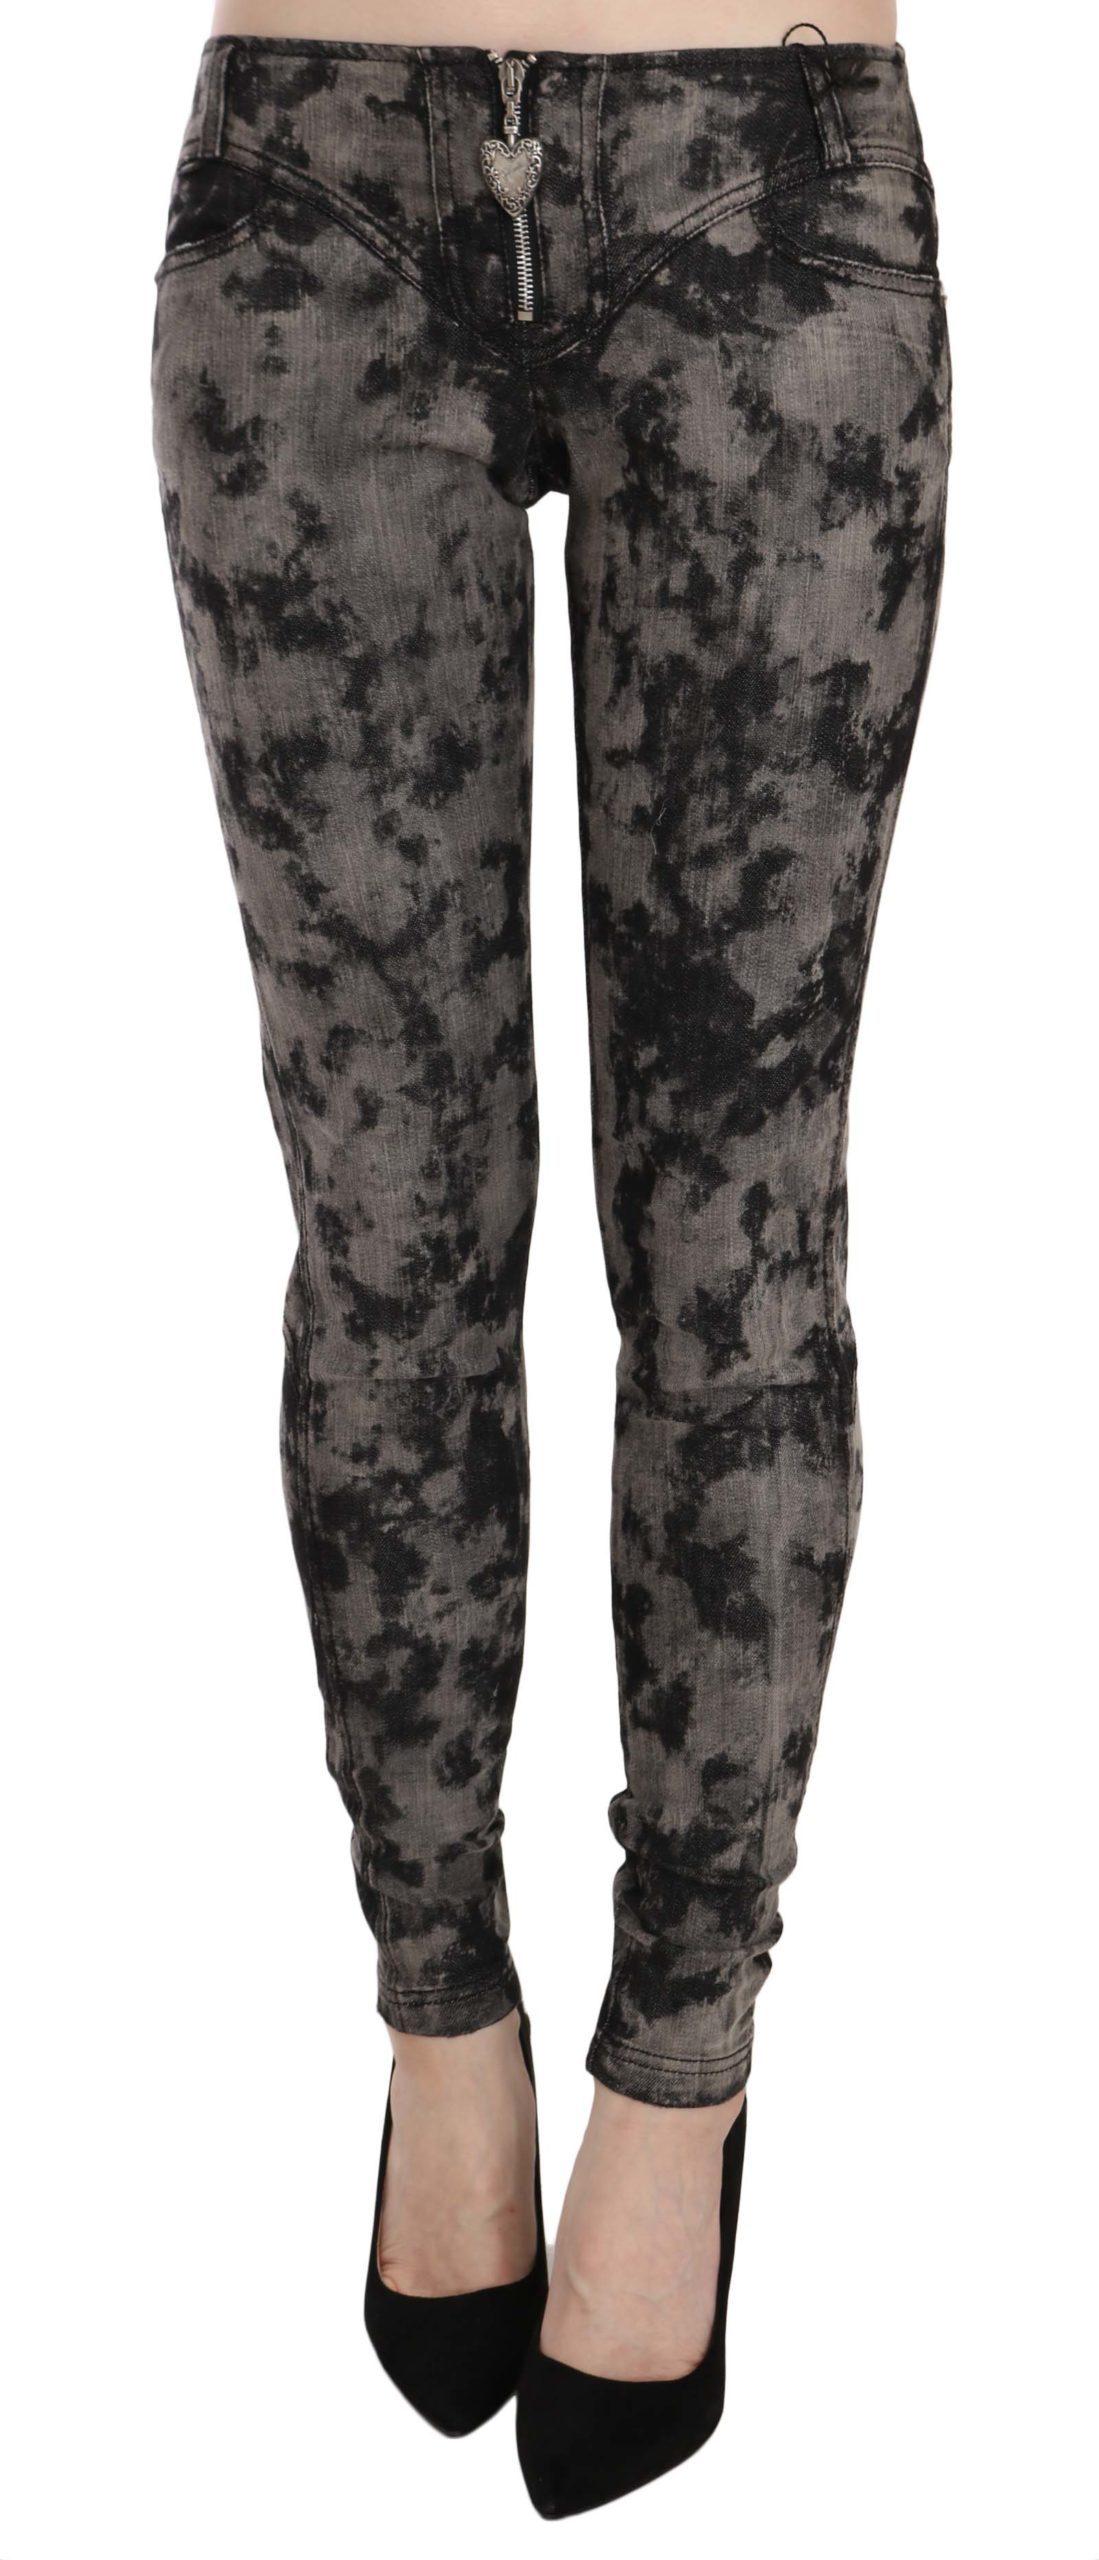 Just Cavalli Women's Low Waist Skinny Denim Trouser Multicolor PAN70329 - W26